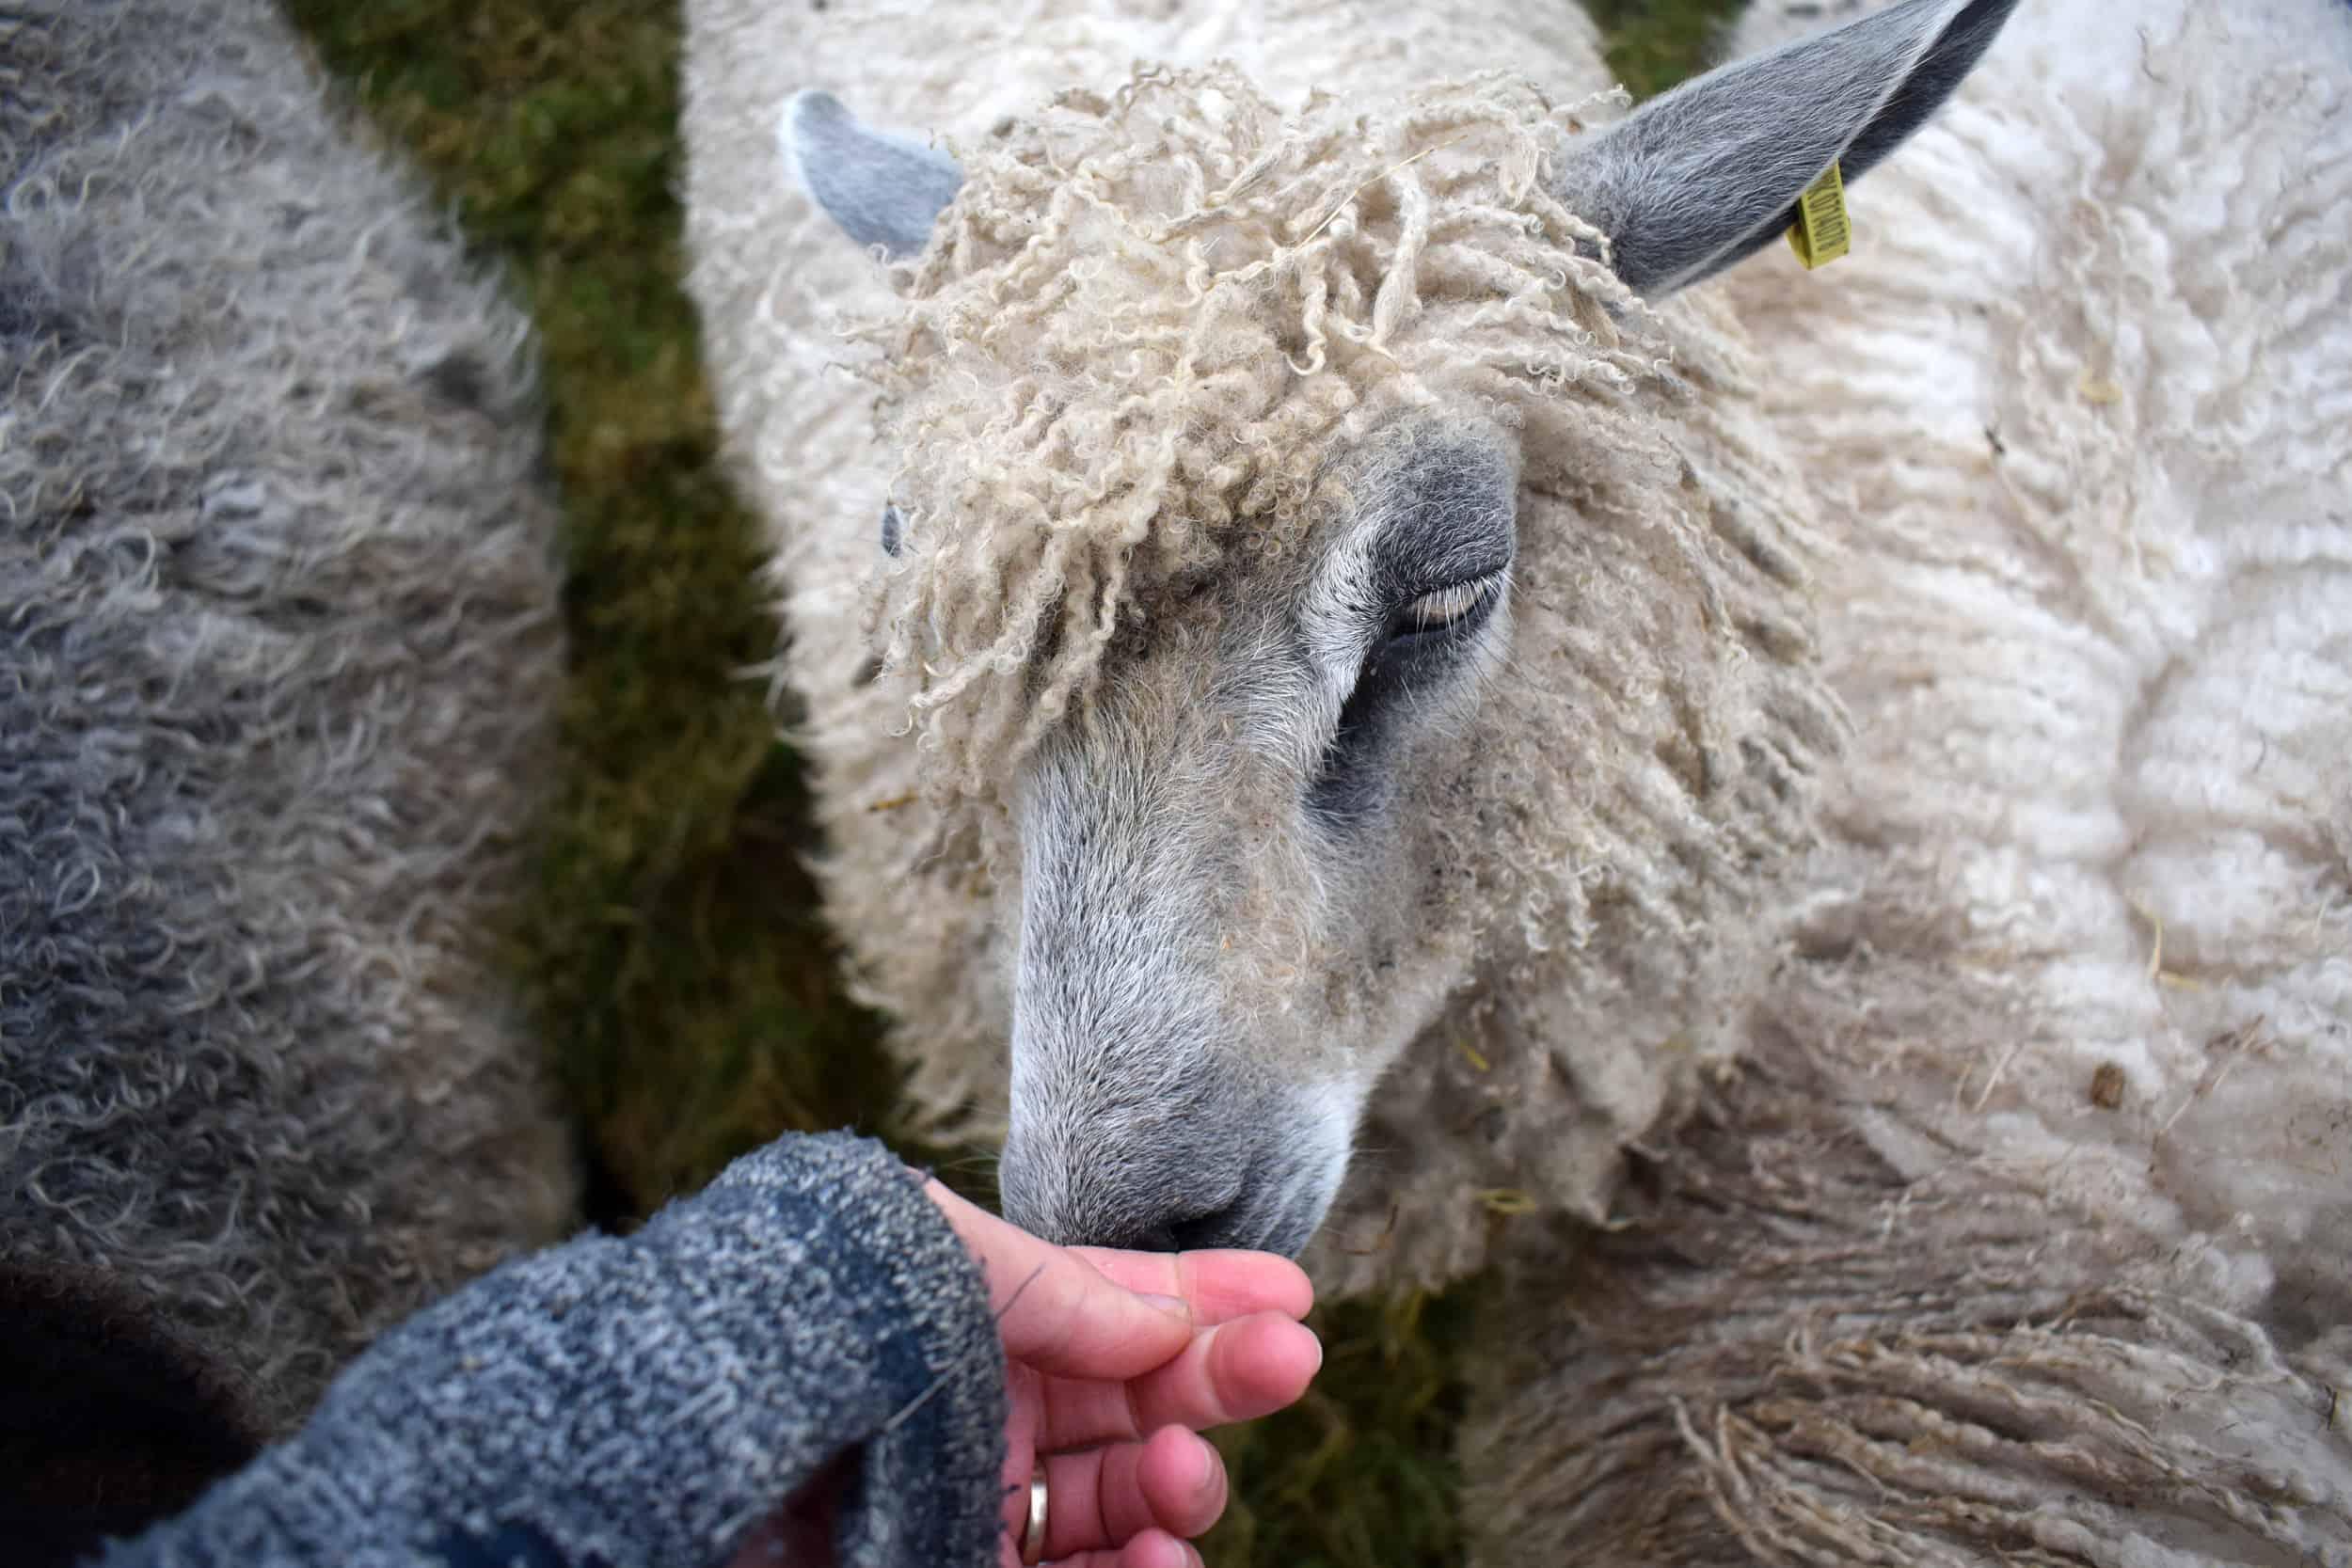 hermione texel x wensleydale patchwork sheep 1 2